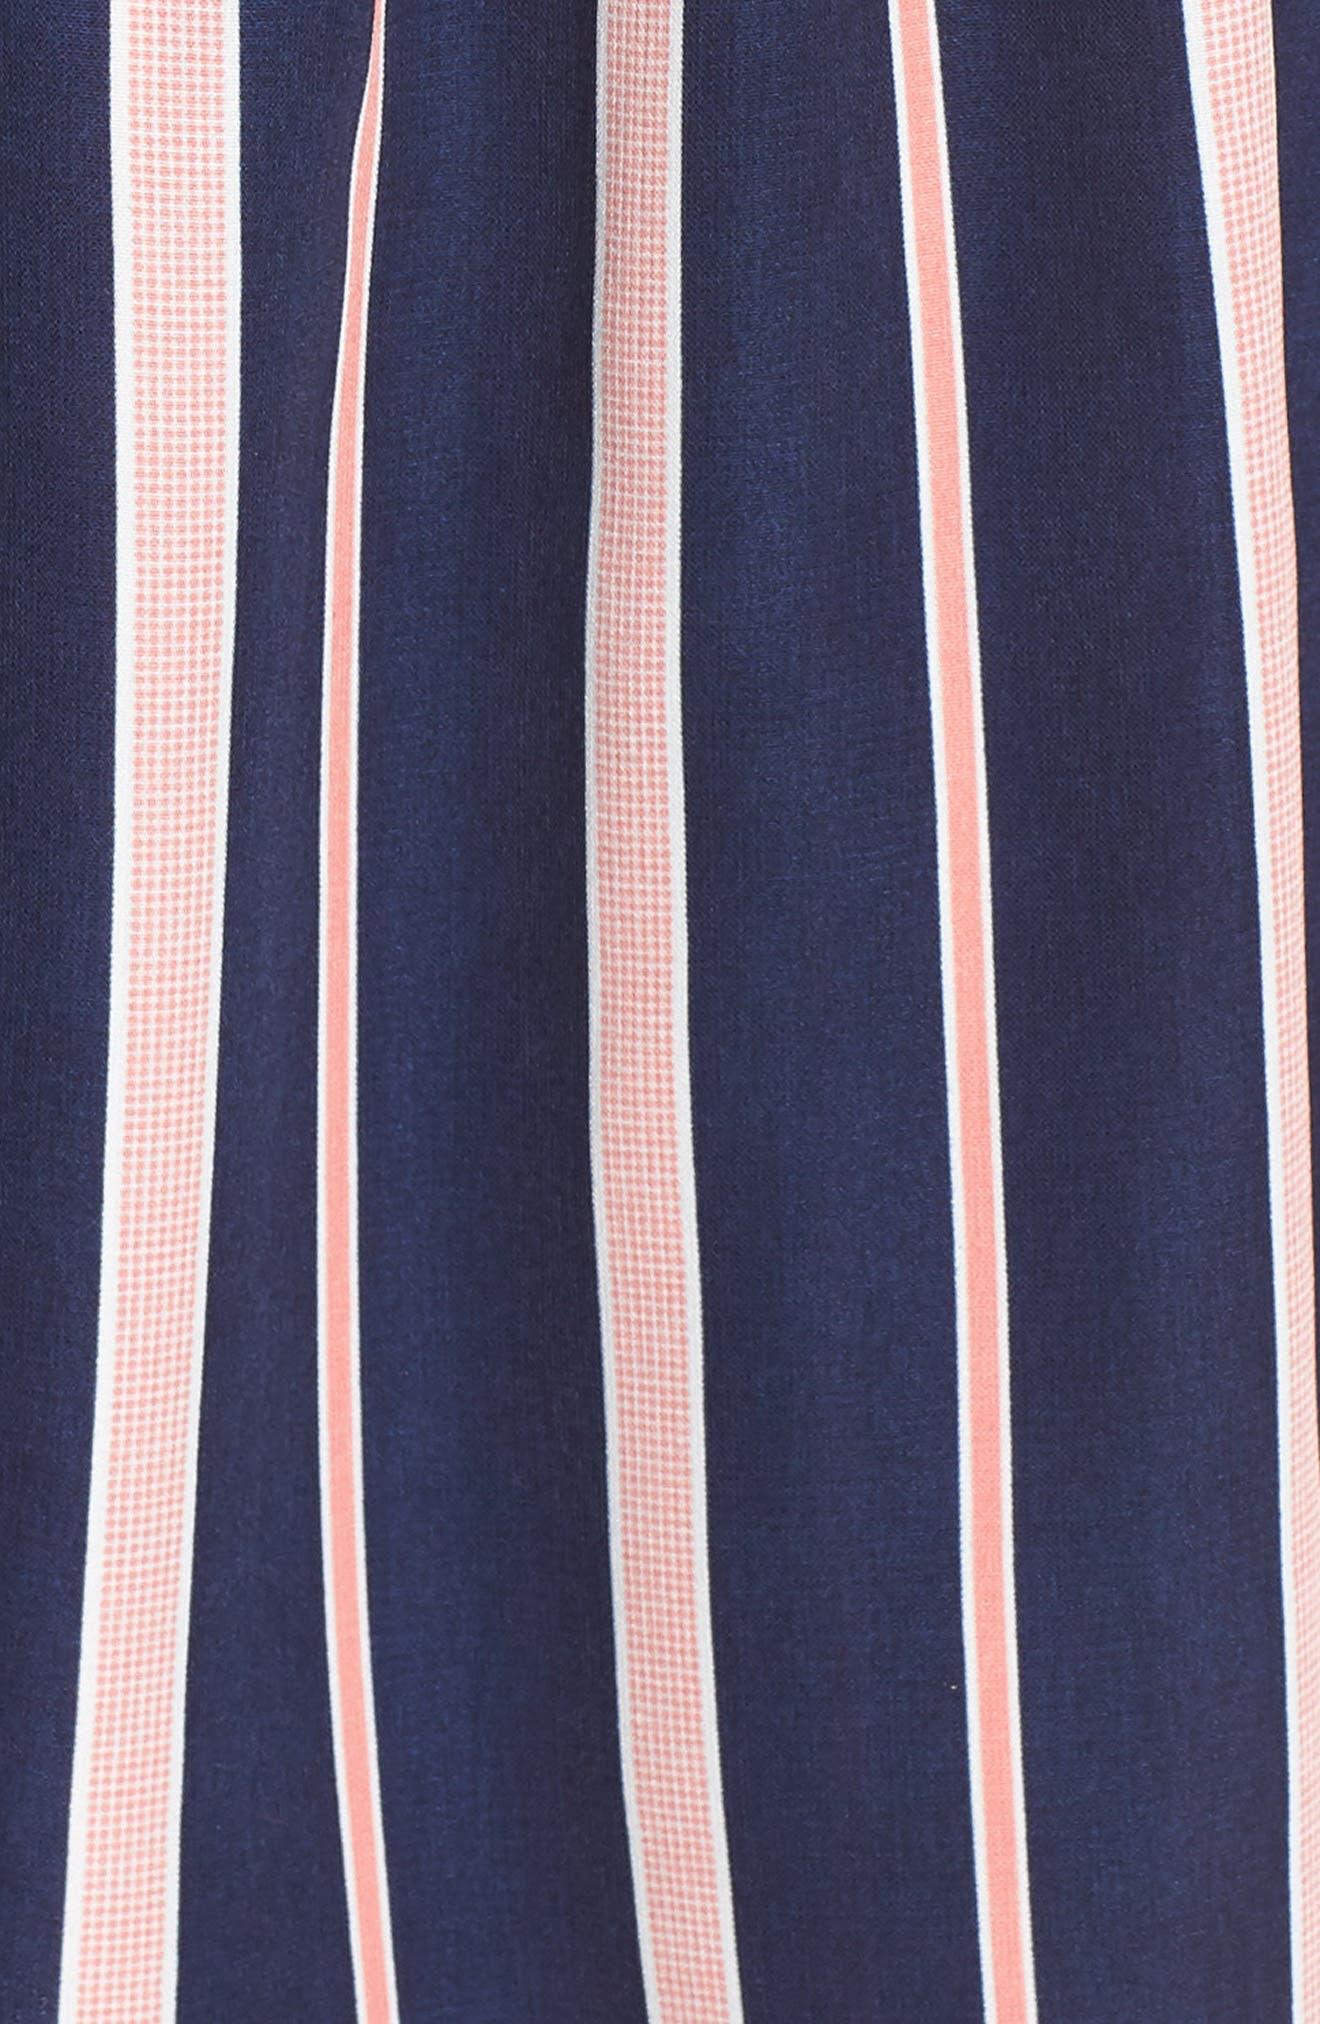 CHARLES HENRY, Smocked Stripe Dress, Alternate thumbnail 6, color, NAVY/ PINK STRIPE